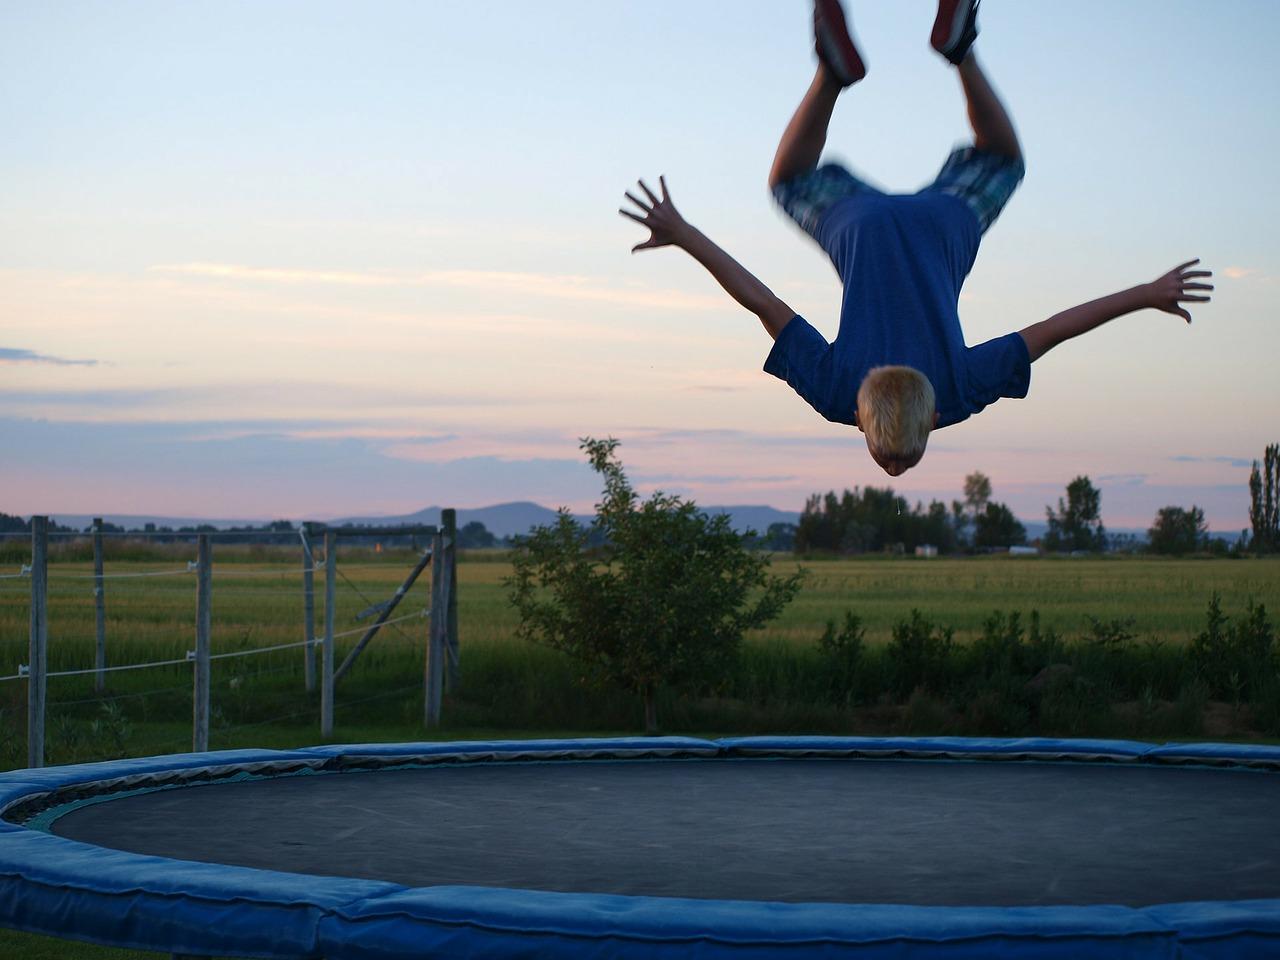 trampoline-71548_1280